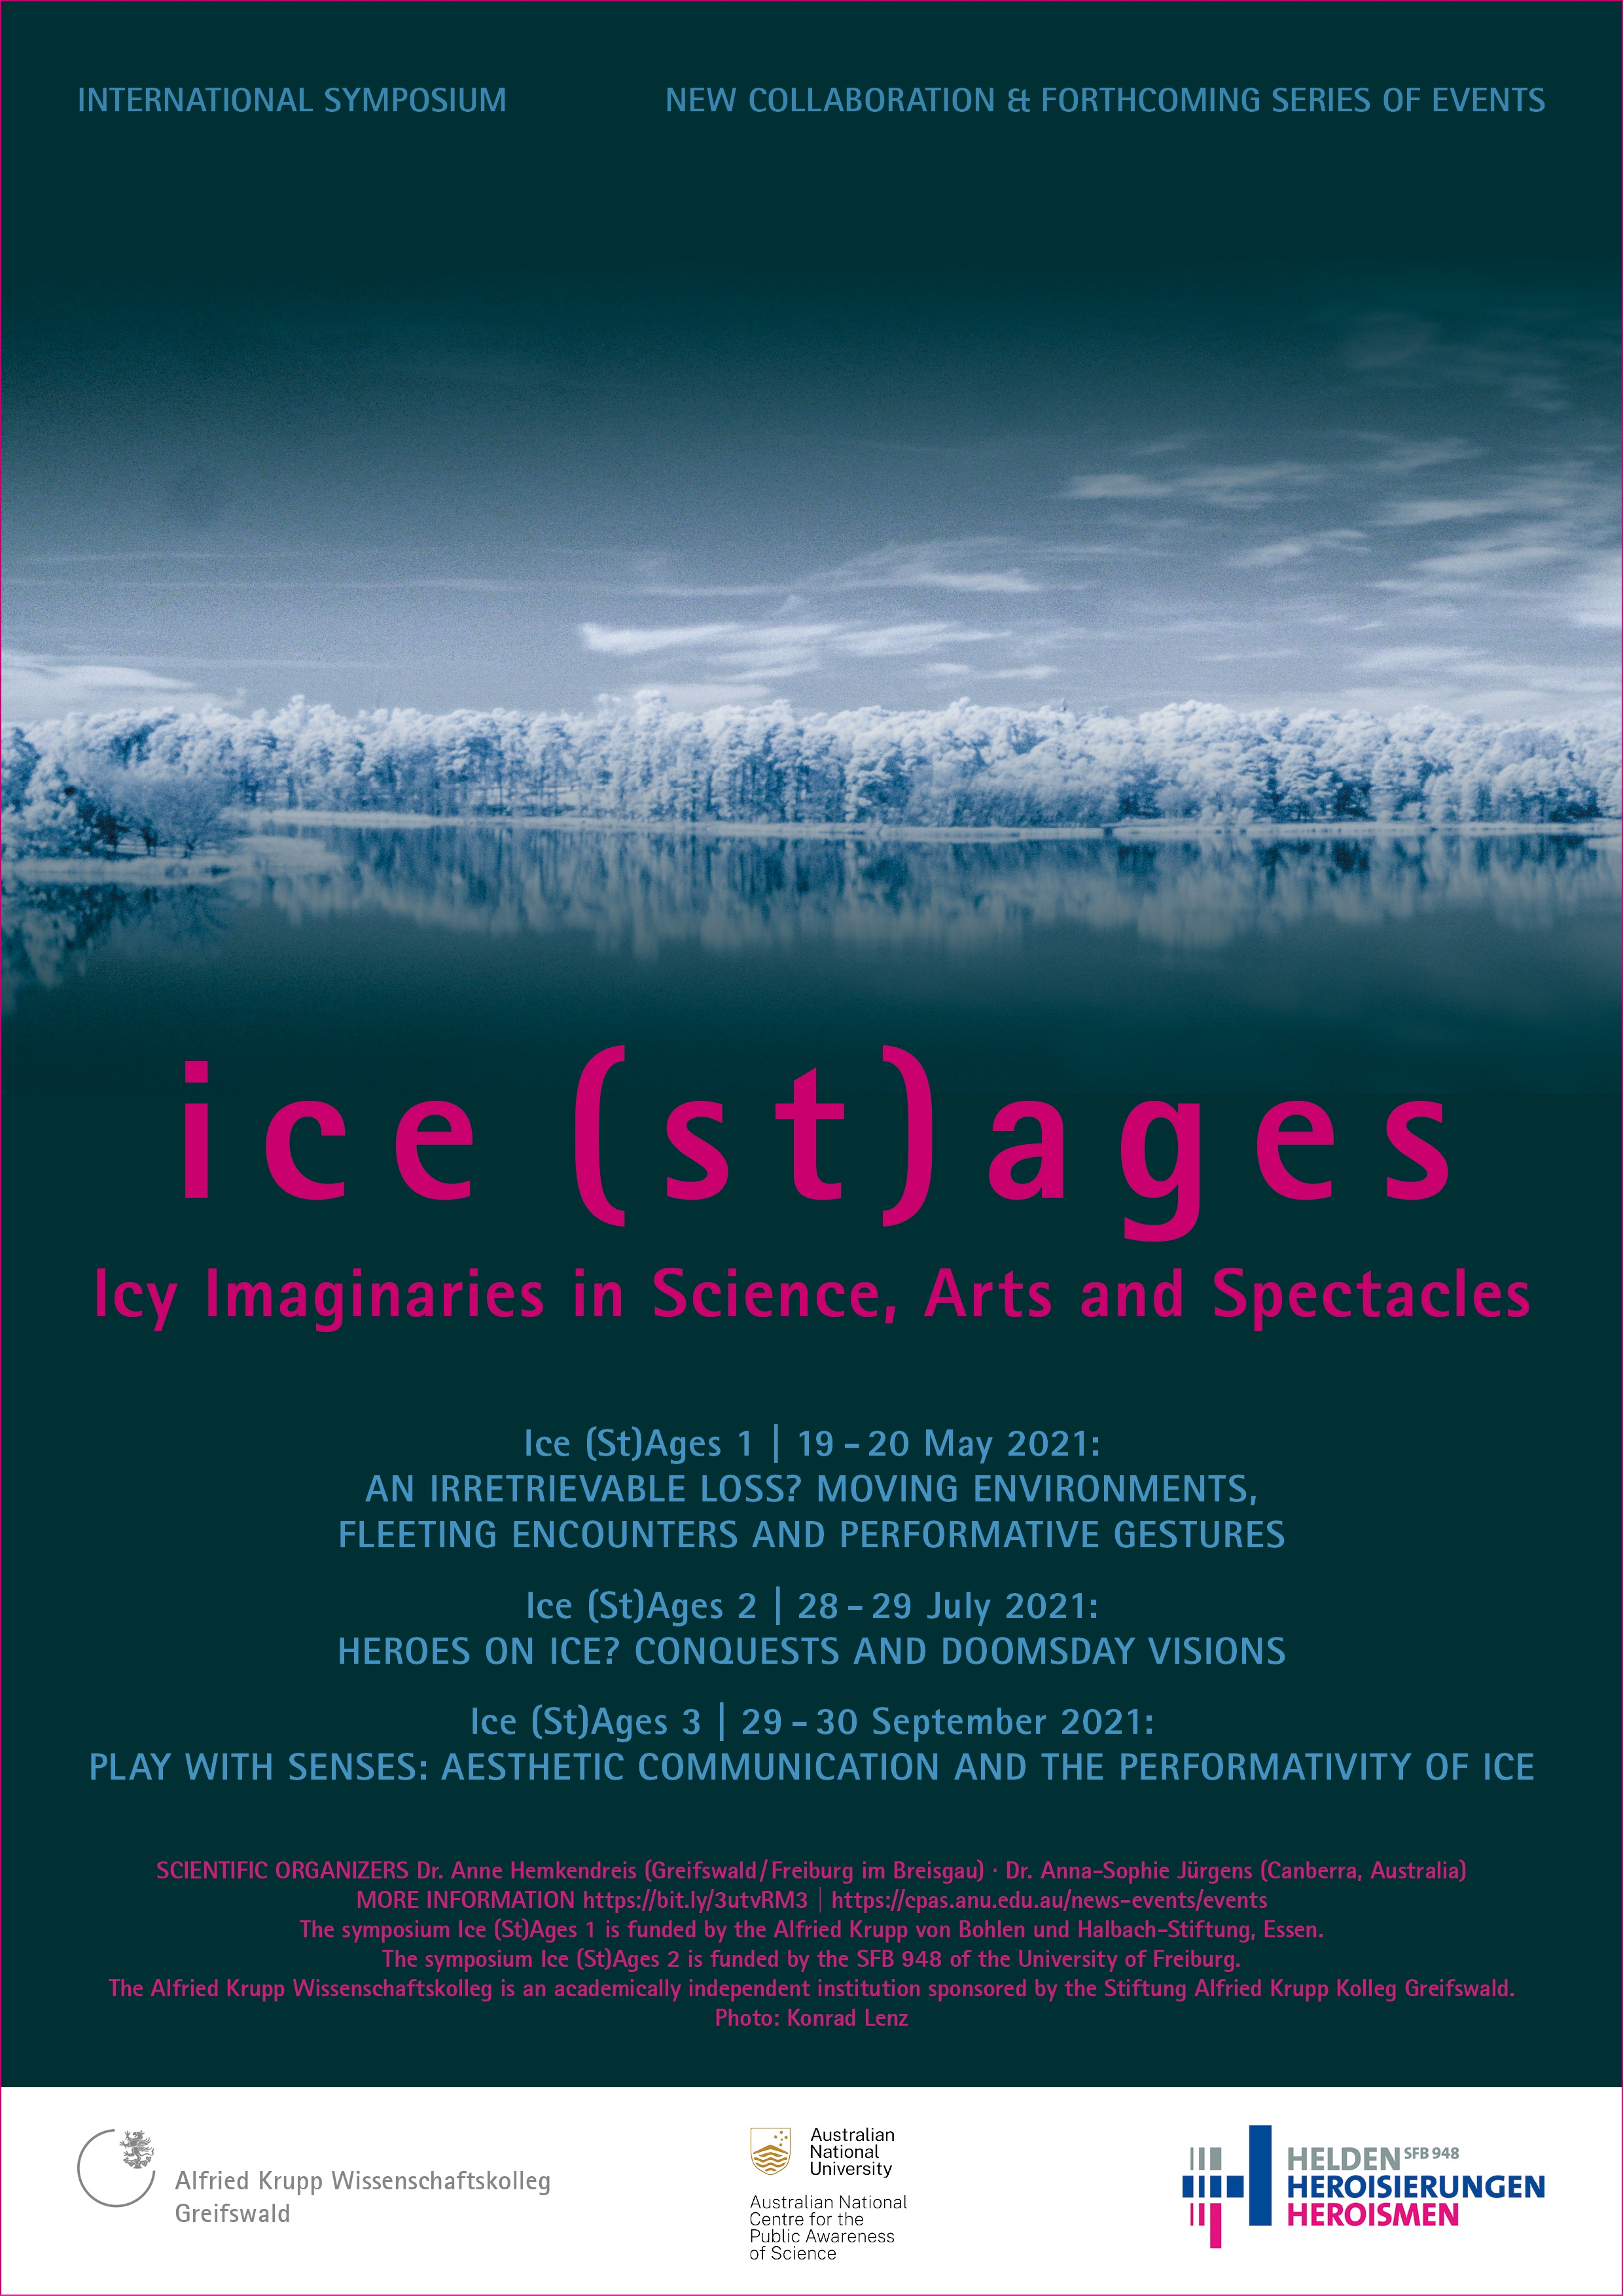 International symposium: Ice (St)Ages 1 (19. & 20. May)